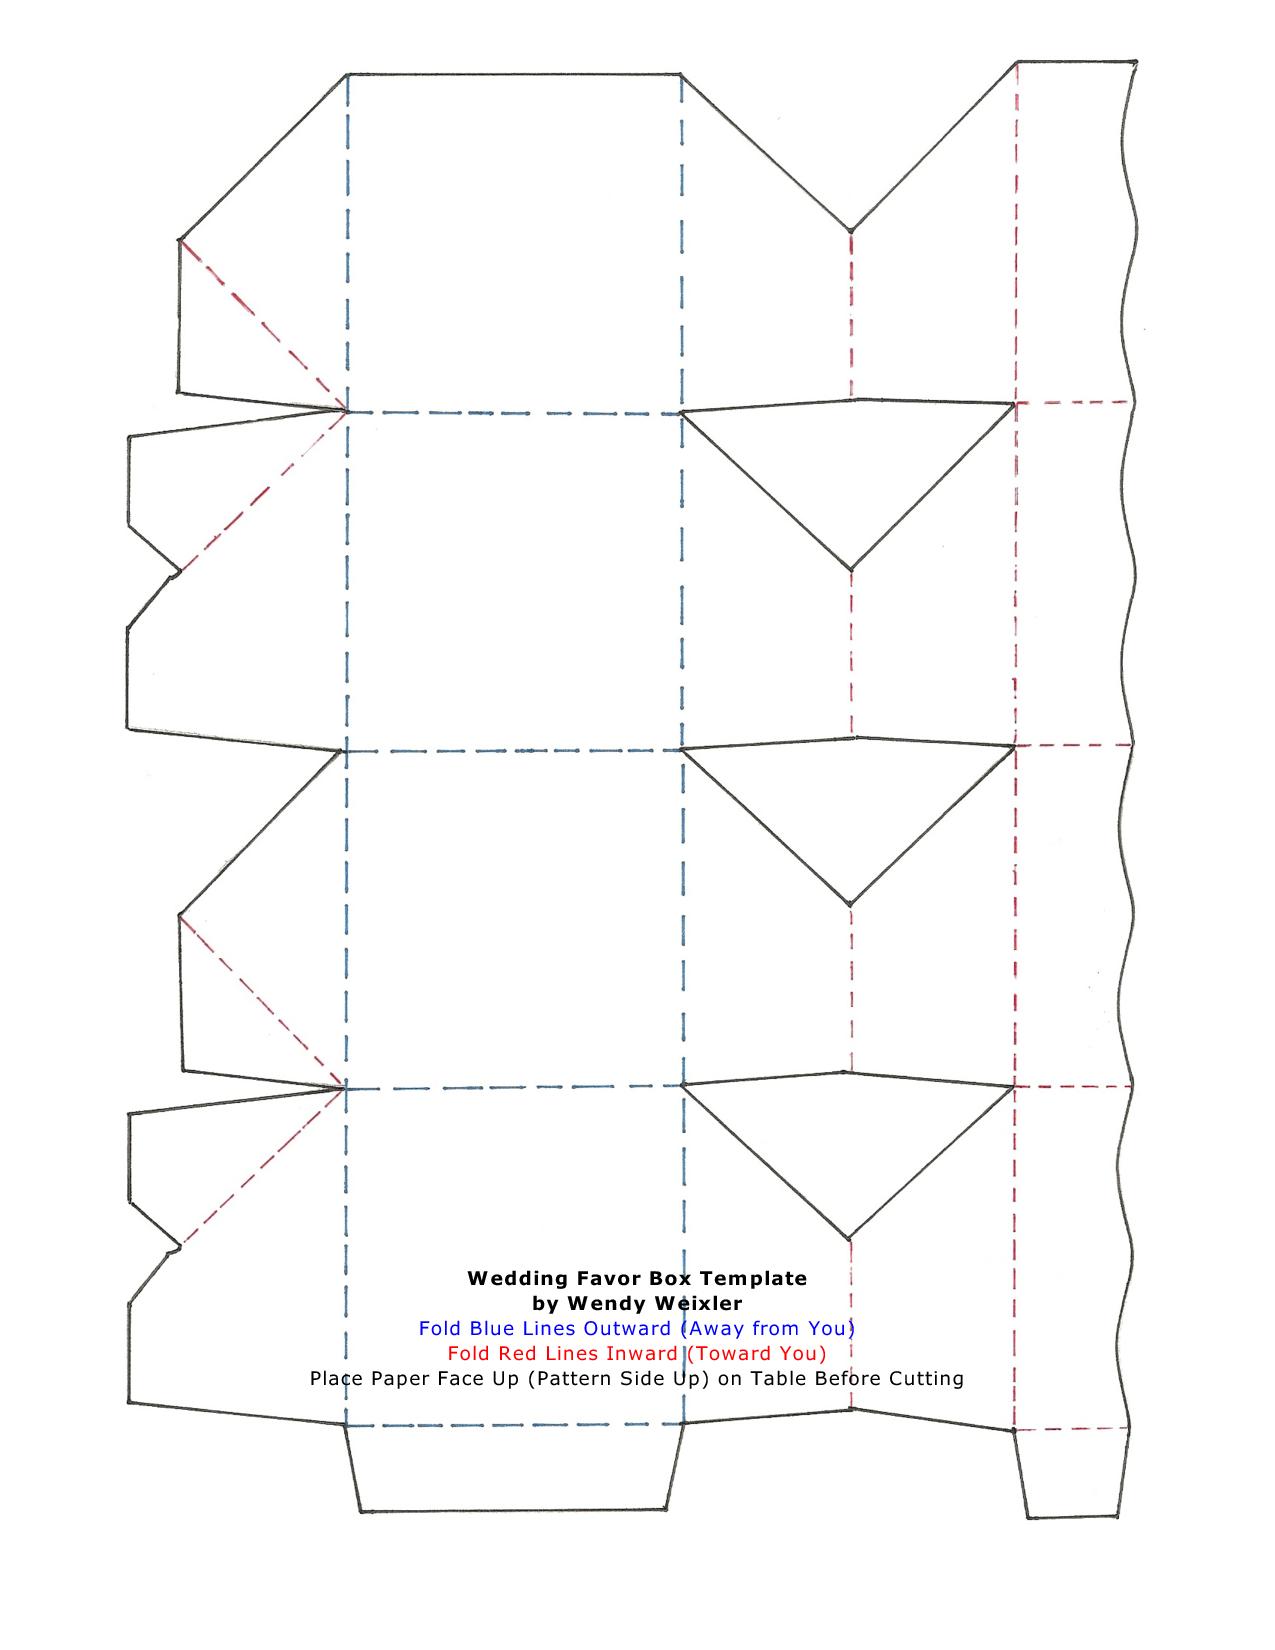 Wedding Favor Gift Box Template : Wedding Templates Favor Box - Free Printable Favor Boxes Templates ...